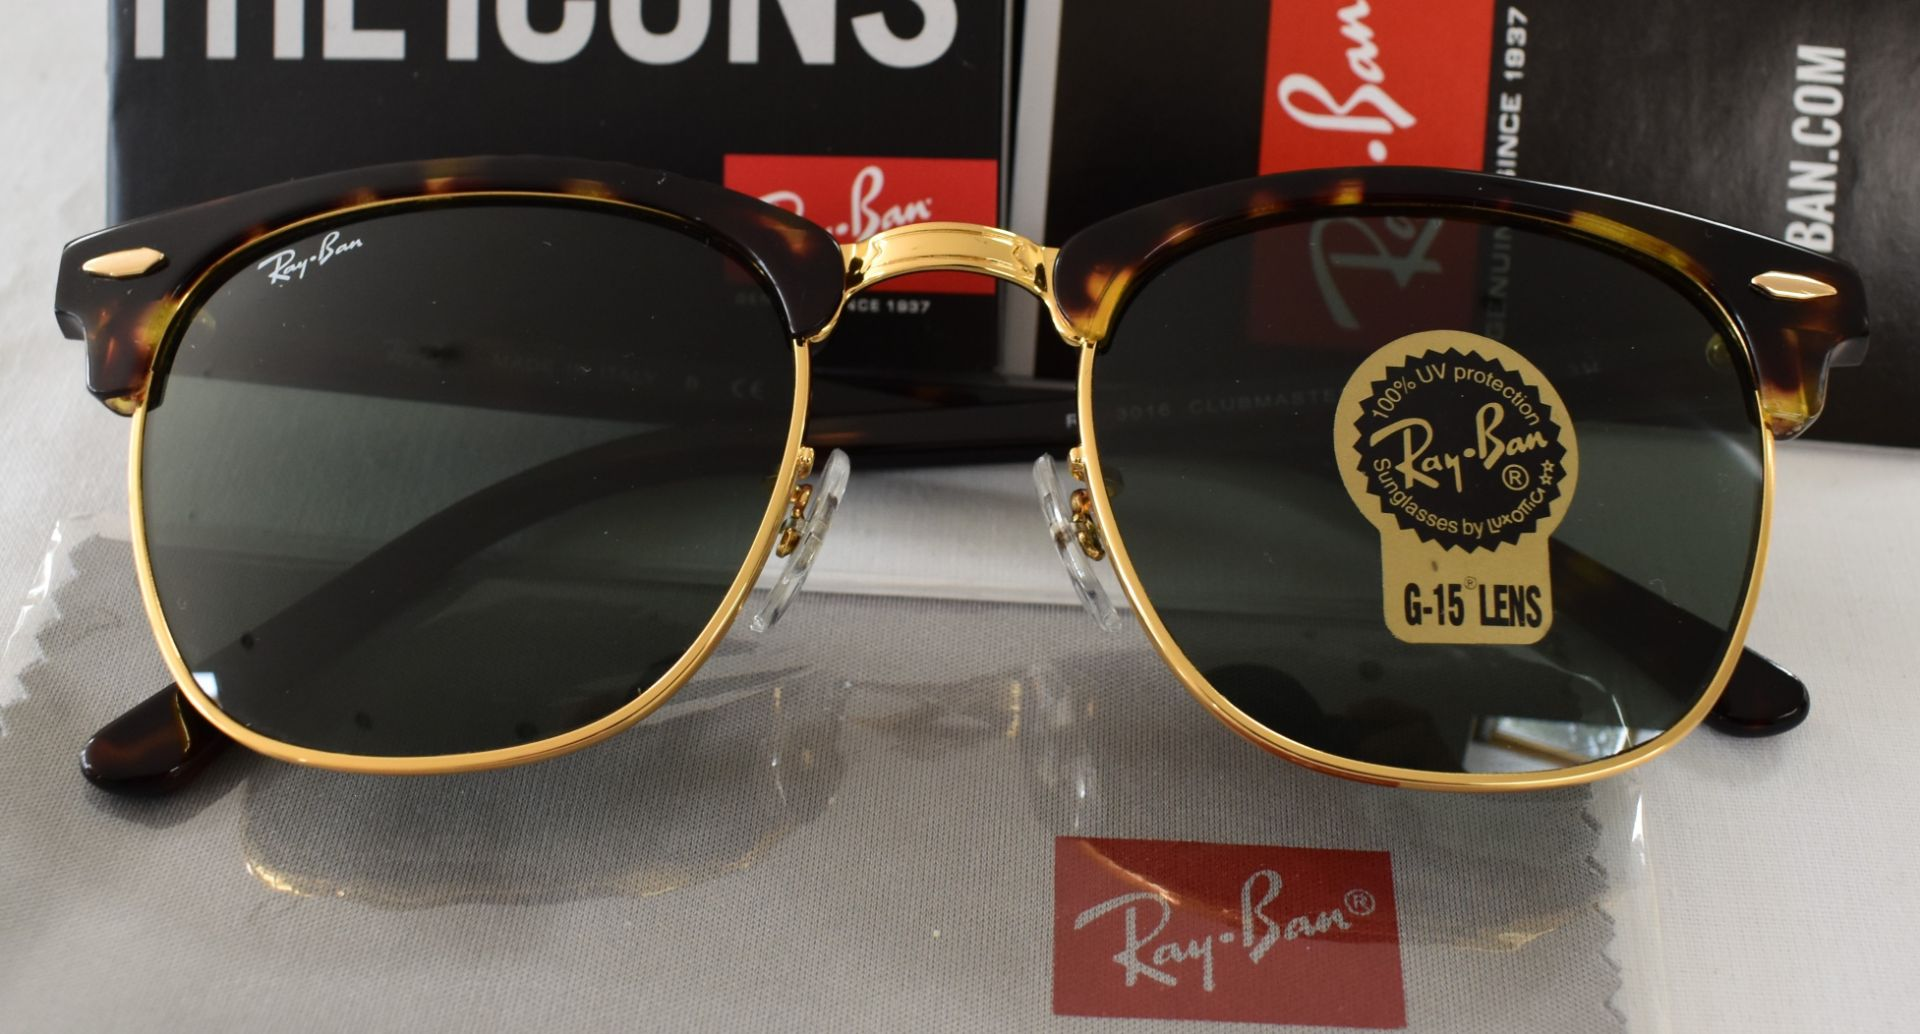 Ray Ban Sunglasses ORB3016 W0366 *3N - Image 2 of 3